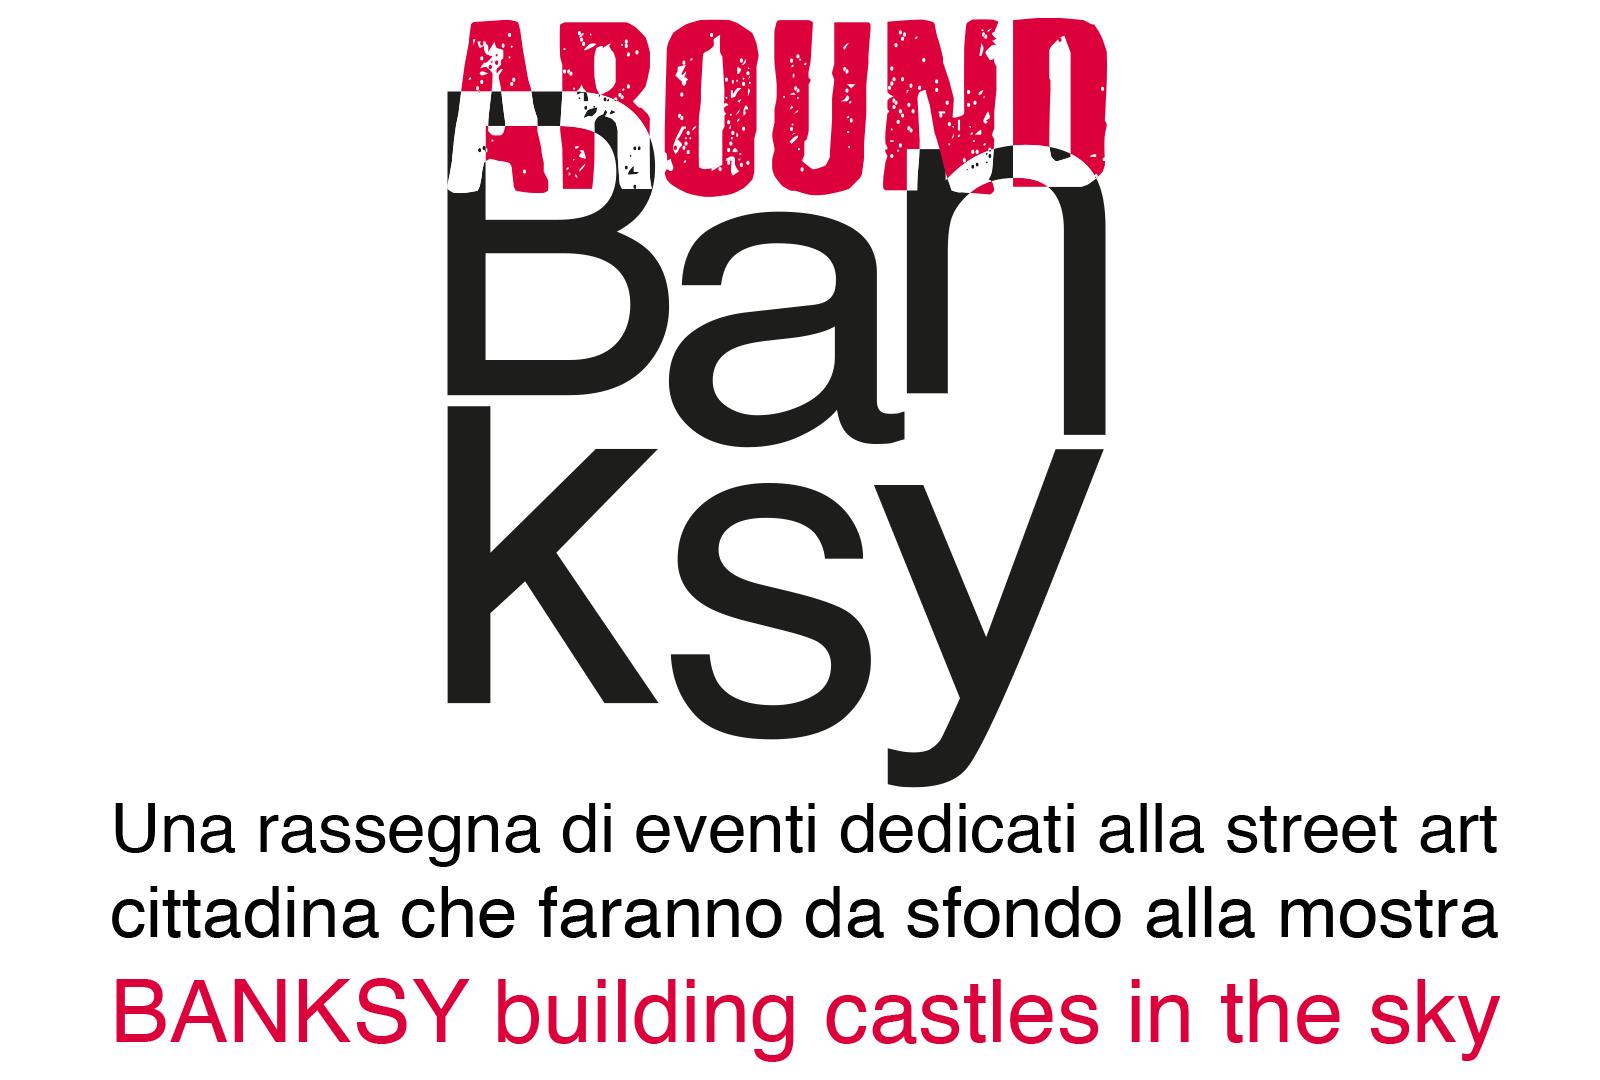 Around Banksy